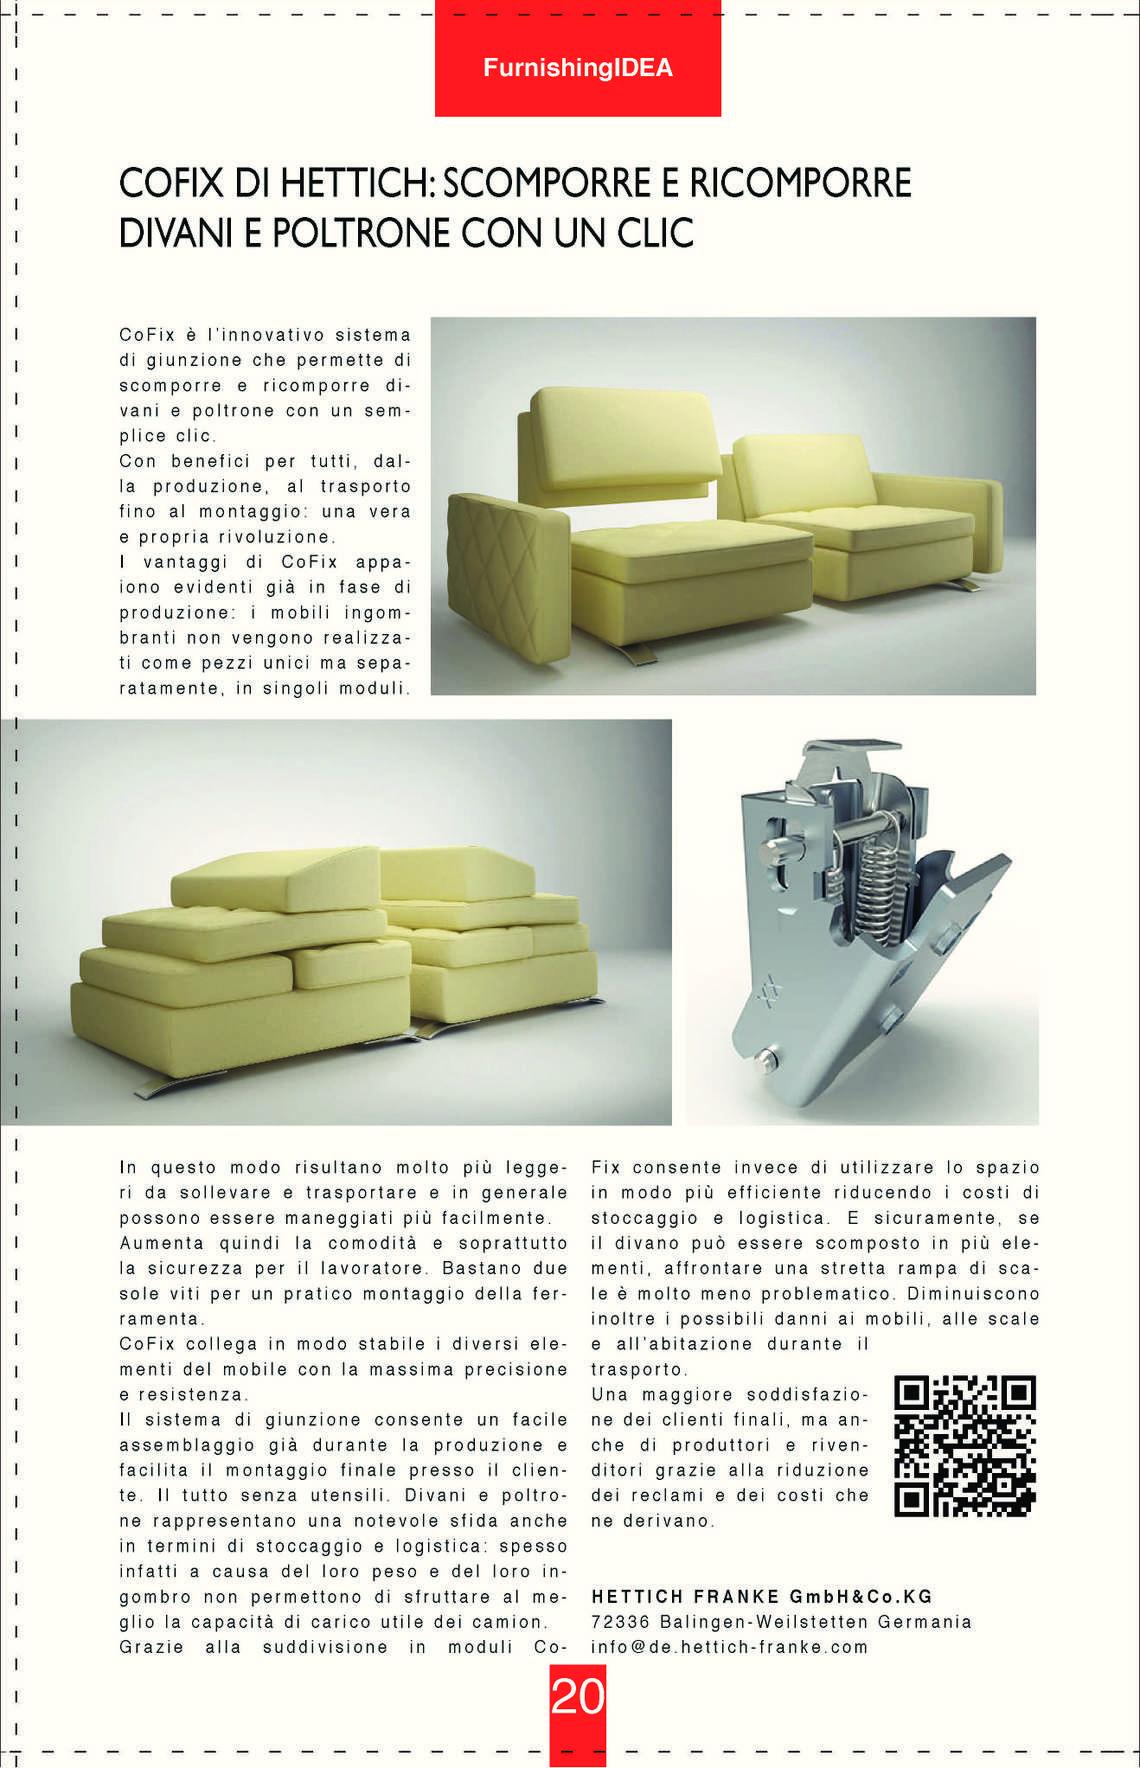 furnishing-idea-journal--1-2018_journal_9_019.jpg